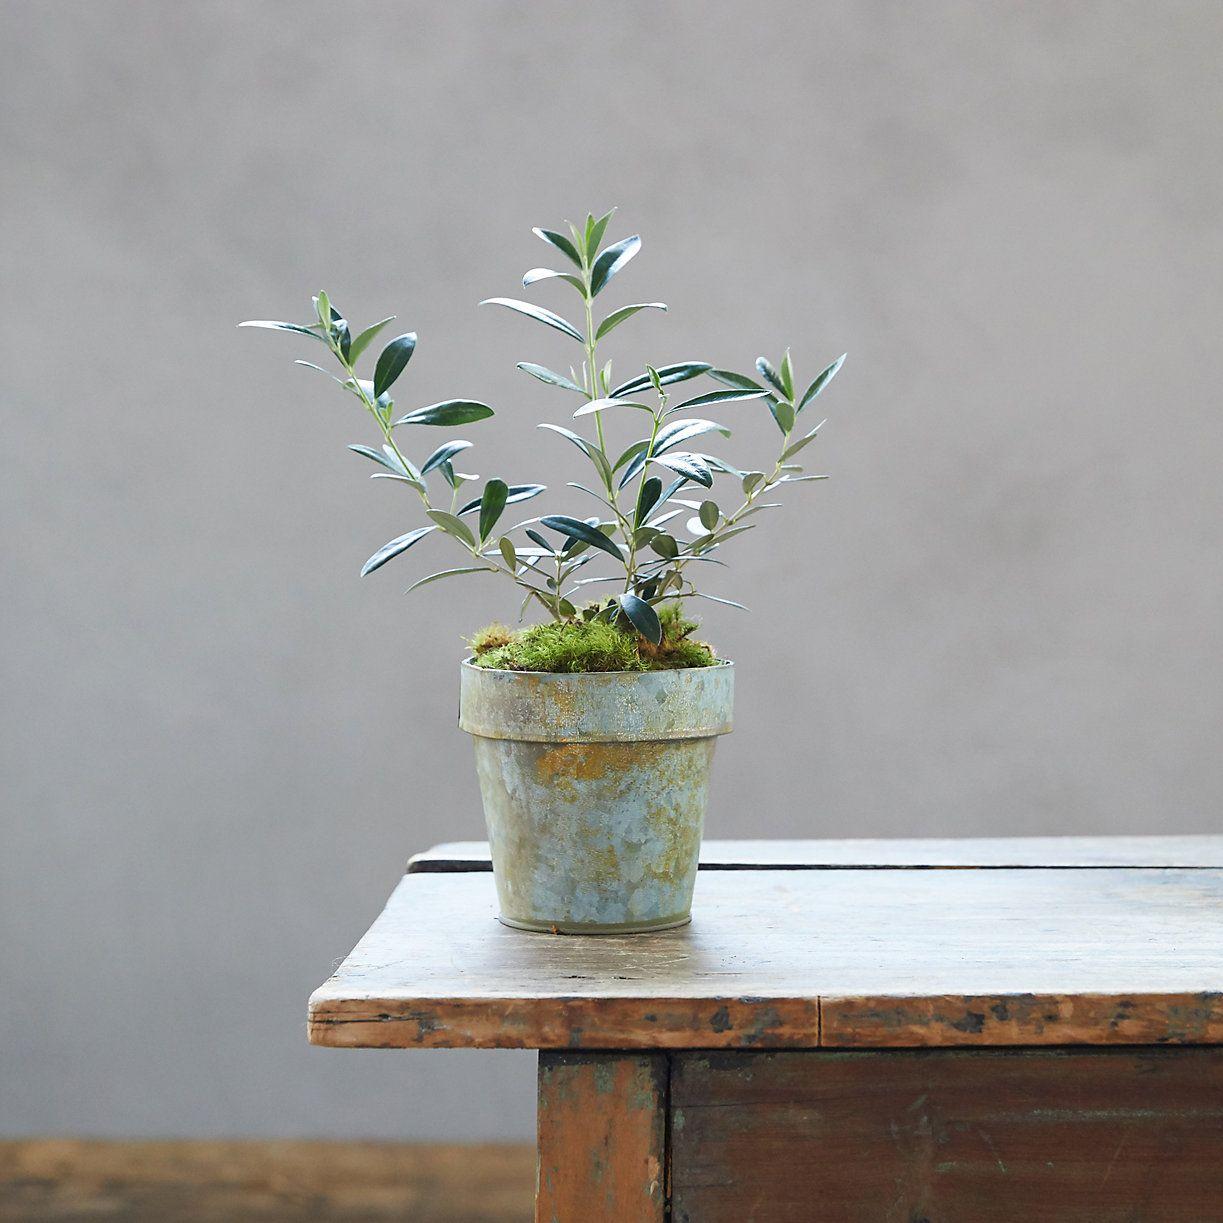 Olive Tree, Metal Pot Plants, House plants, Winter plants